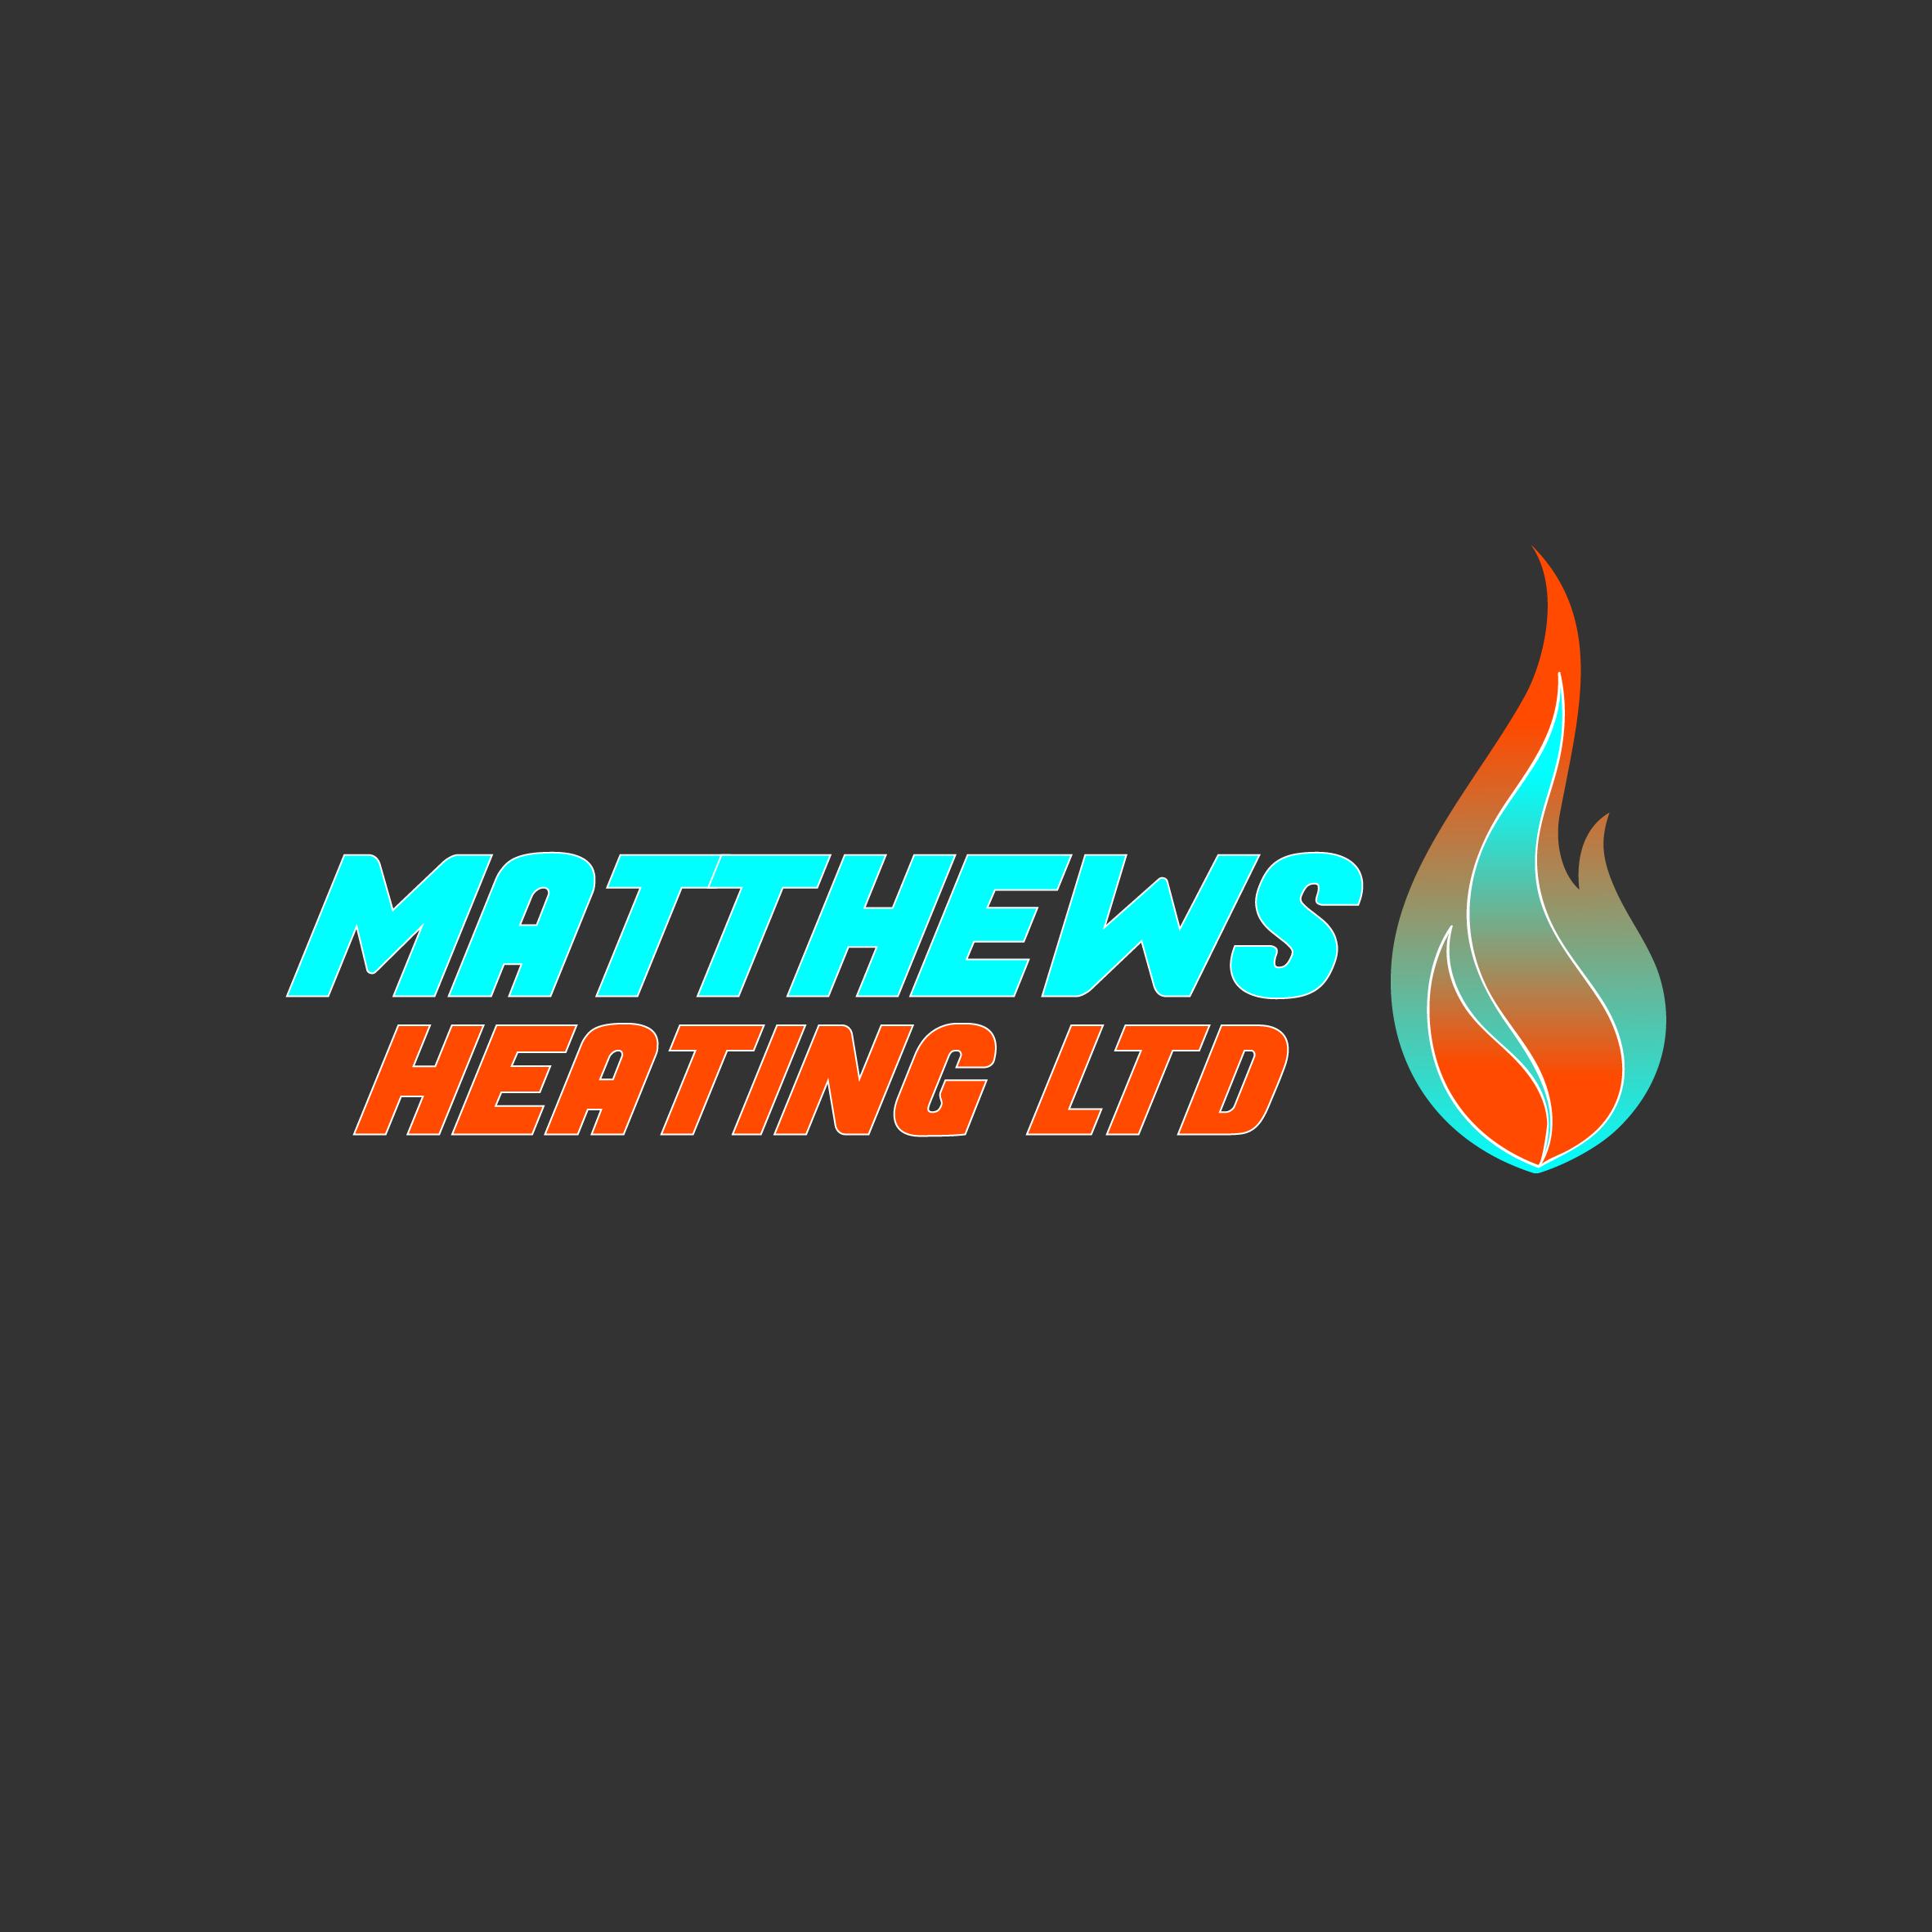 Matthews Heating Ltd Verified Logo